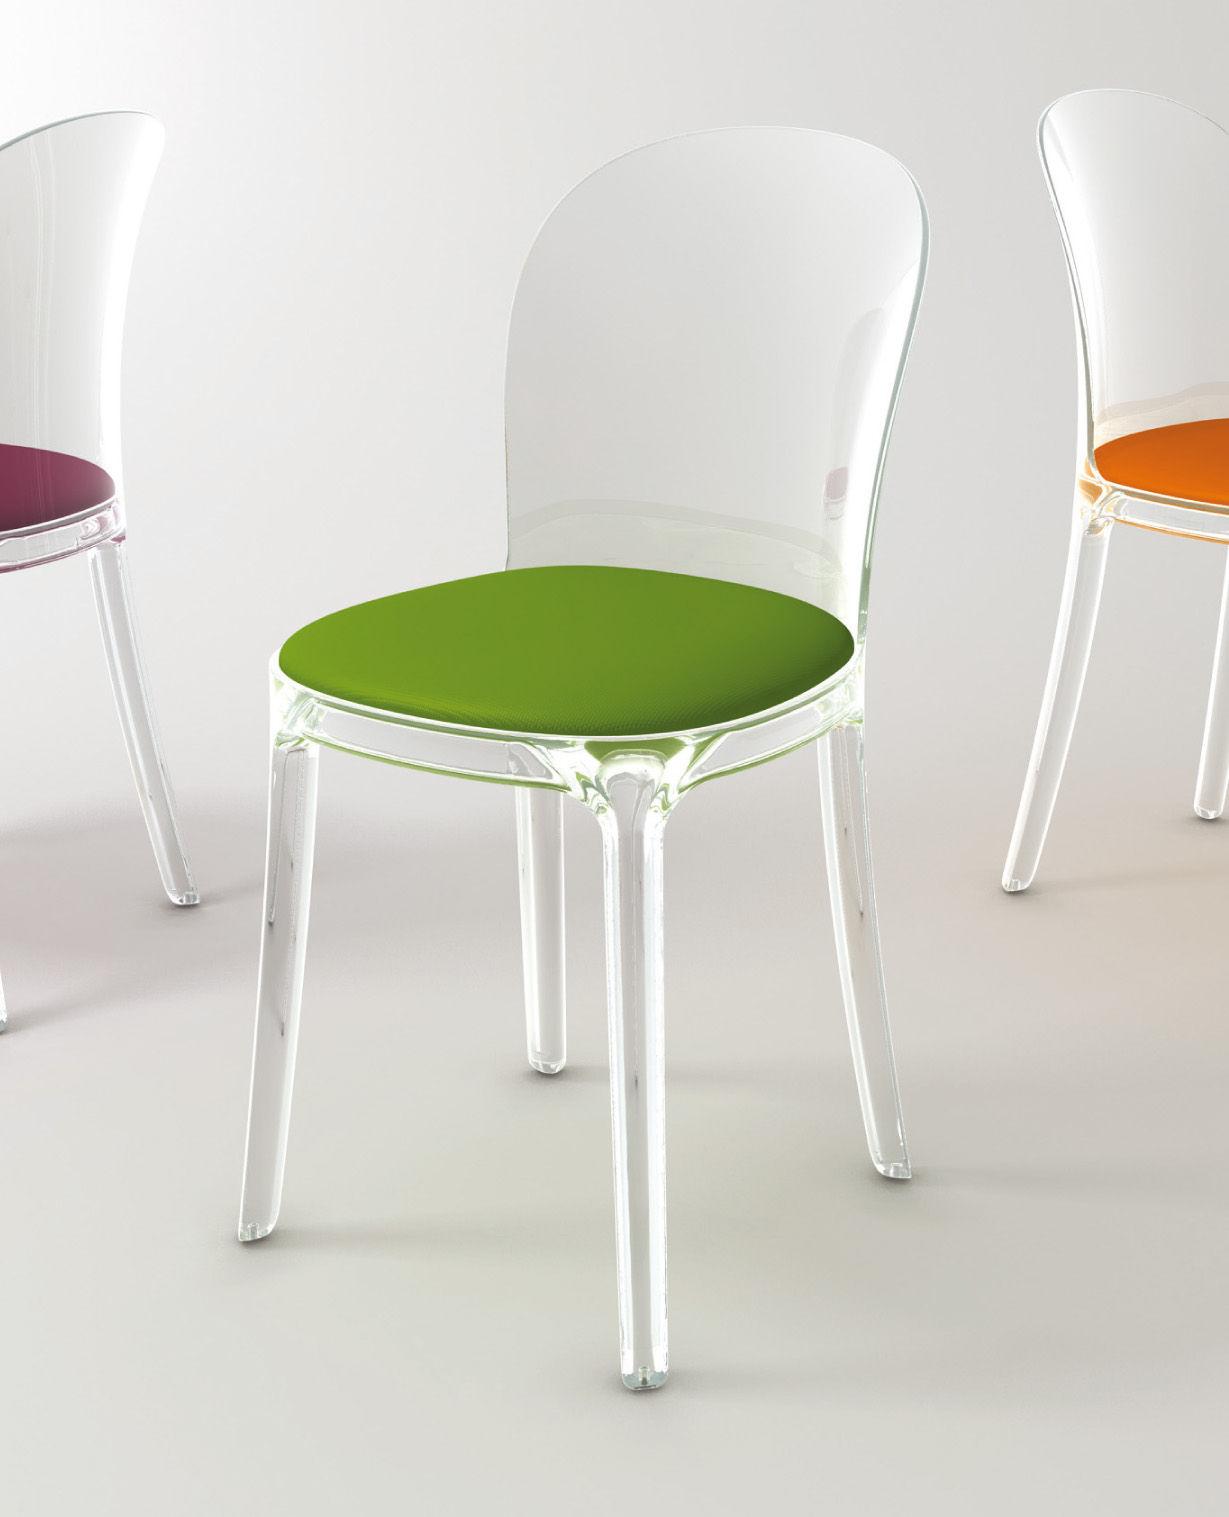 Scopri sedia vanity chair struttura trasparente - Sedia trasparente economica ...